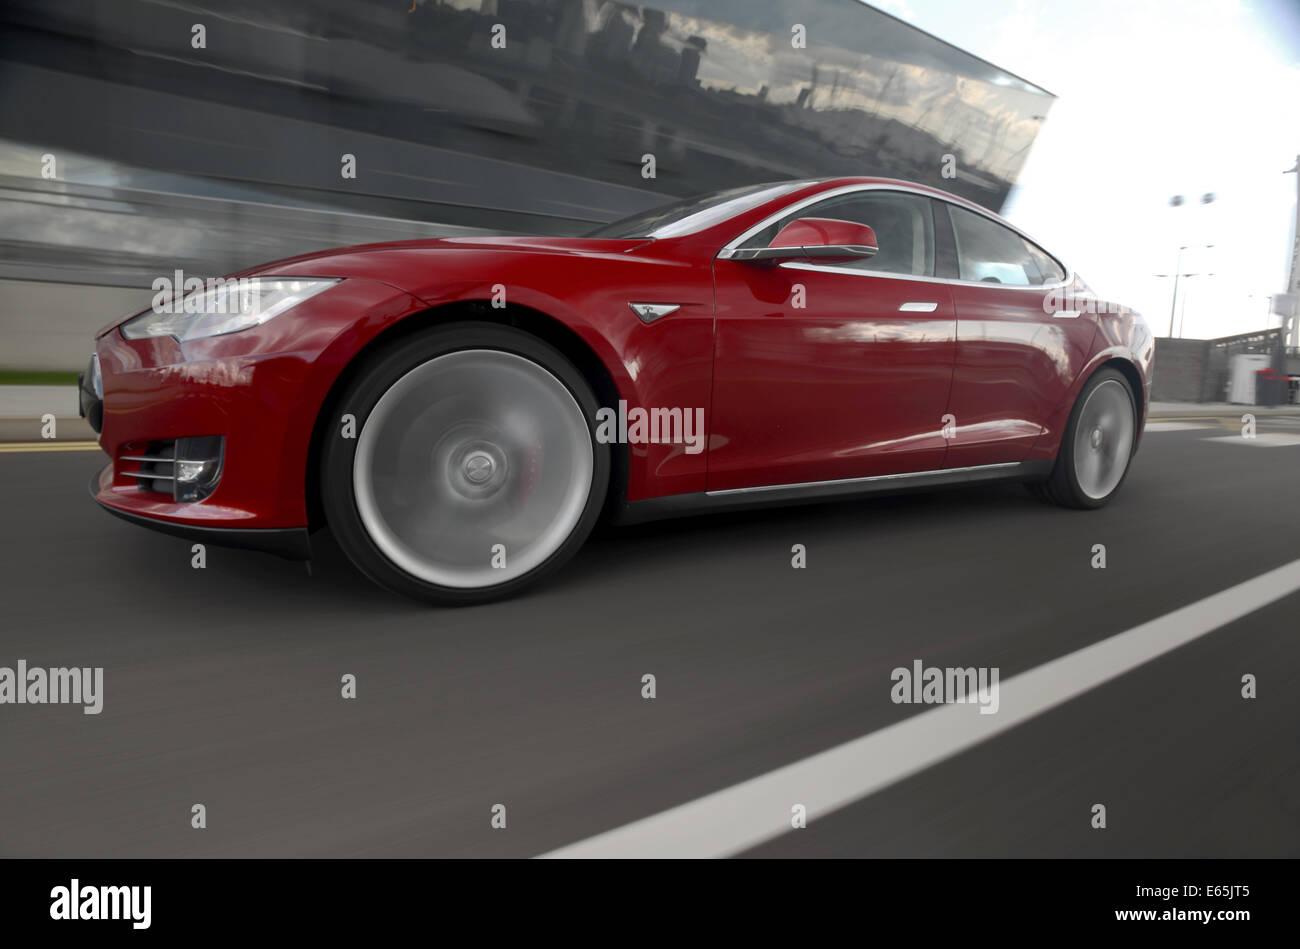 Tesla Model S electric luxury sports saloon car - Stock Image